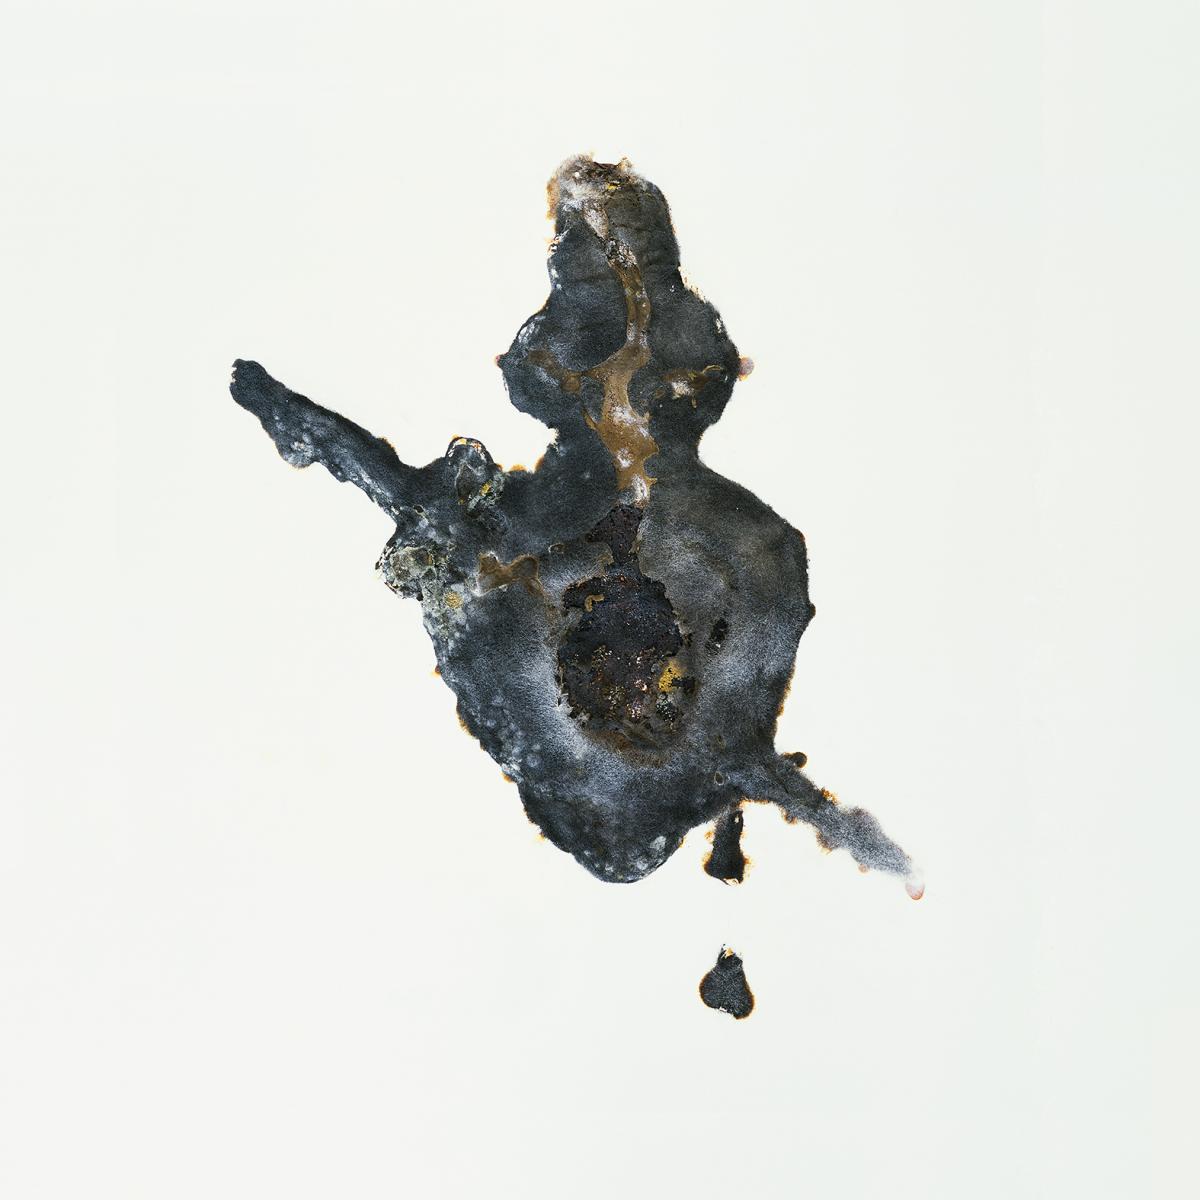 Filip Berendt, Pandemic  X, 2009, photography archival print on dibond ed.62AP, 80×80 cm